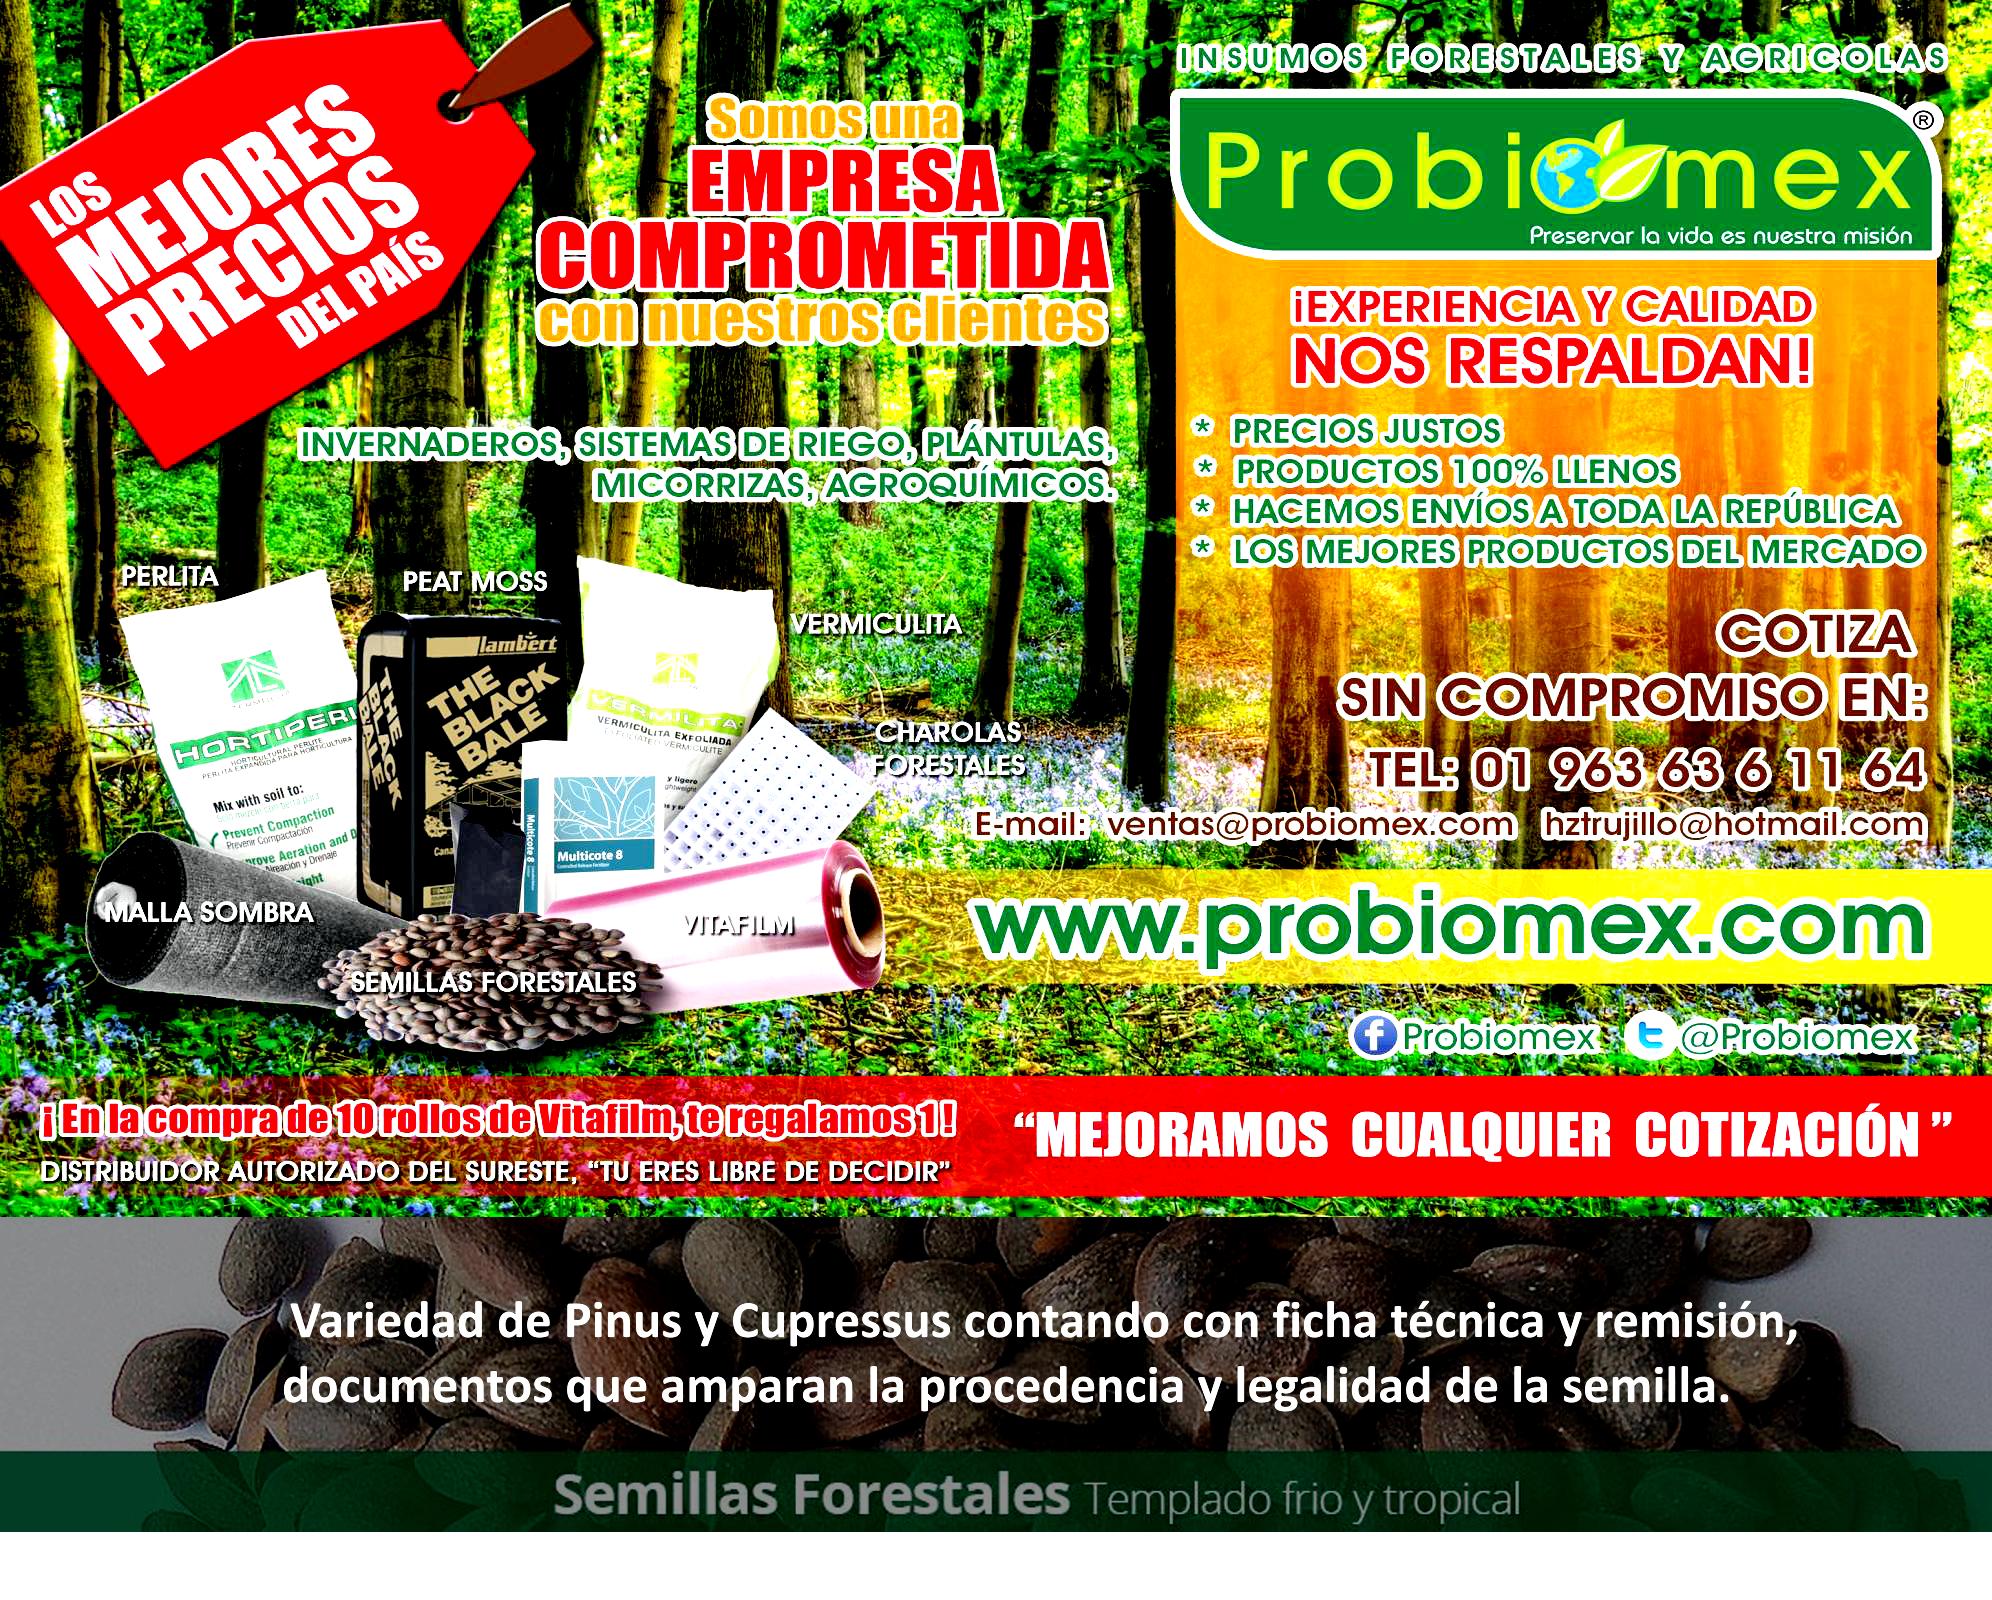 PROBIOMEX